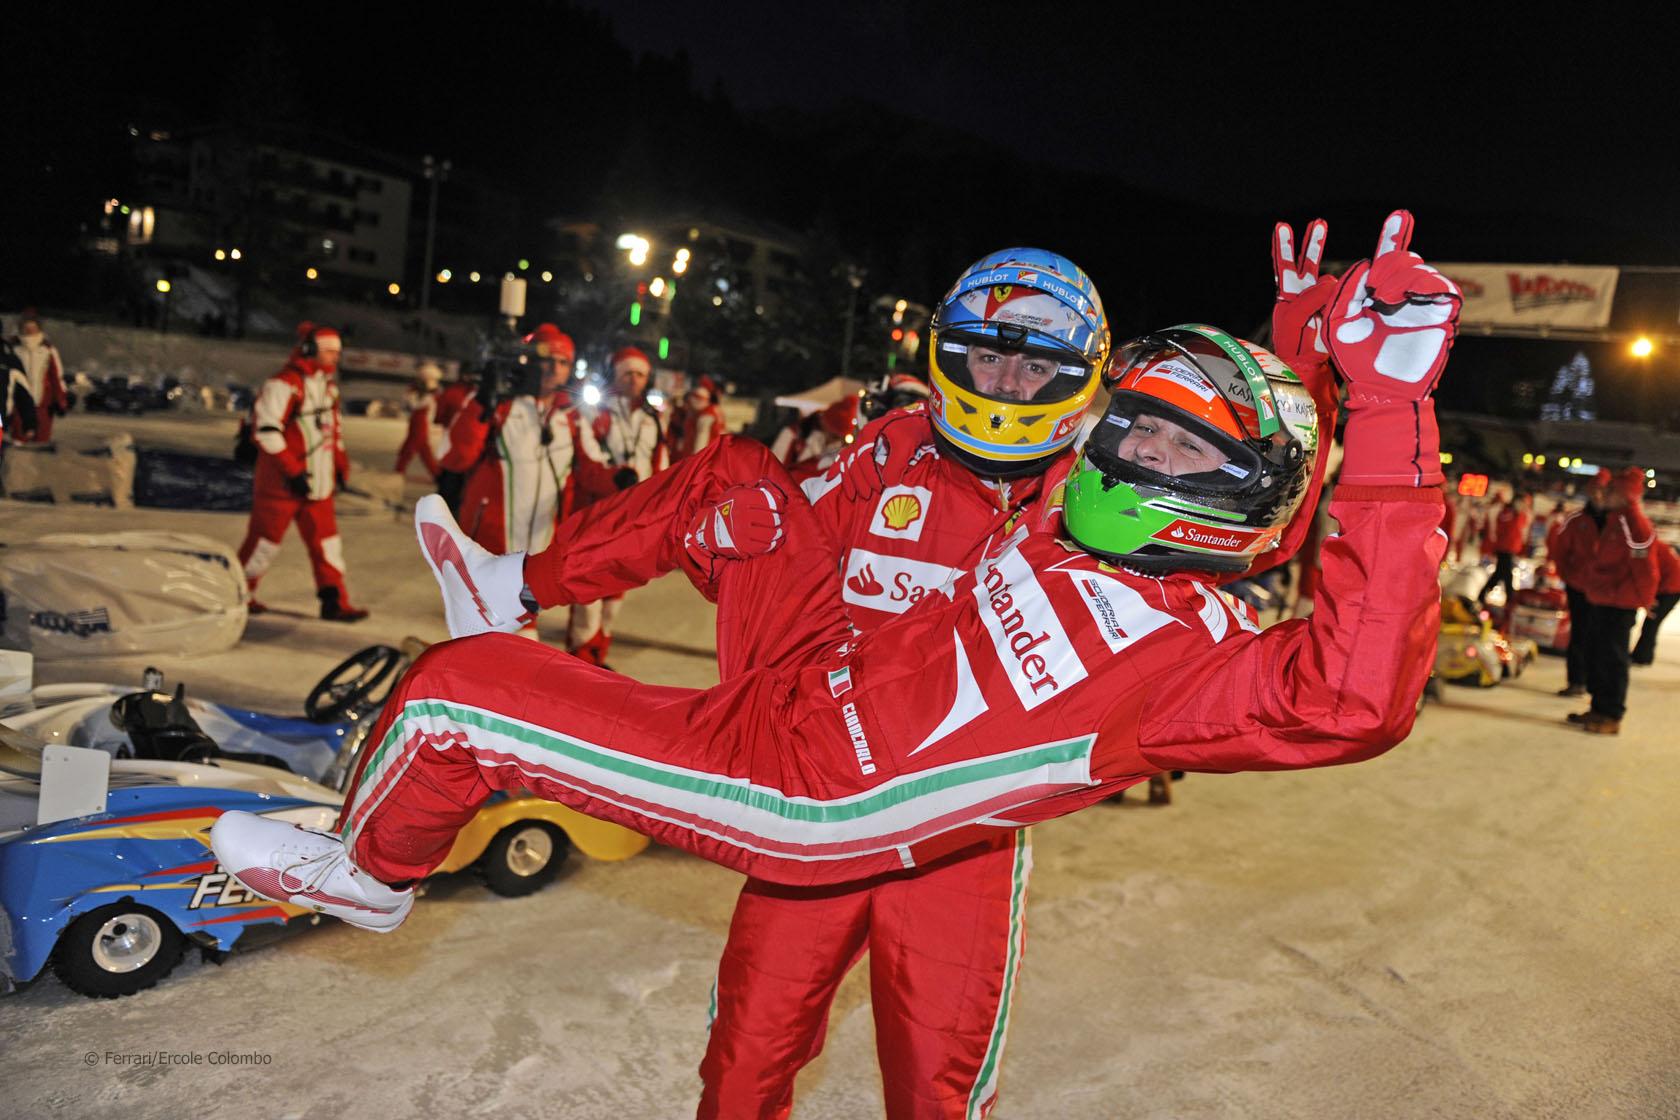 Fernando Alonso, Giancarlo Fisichella, 2013